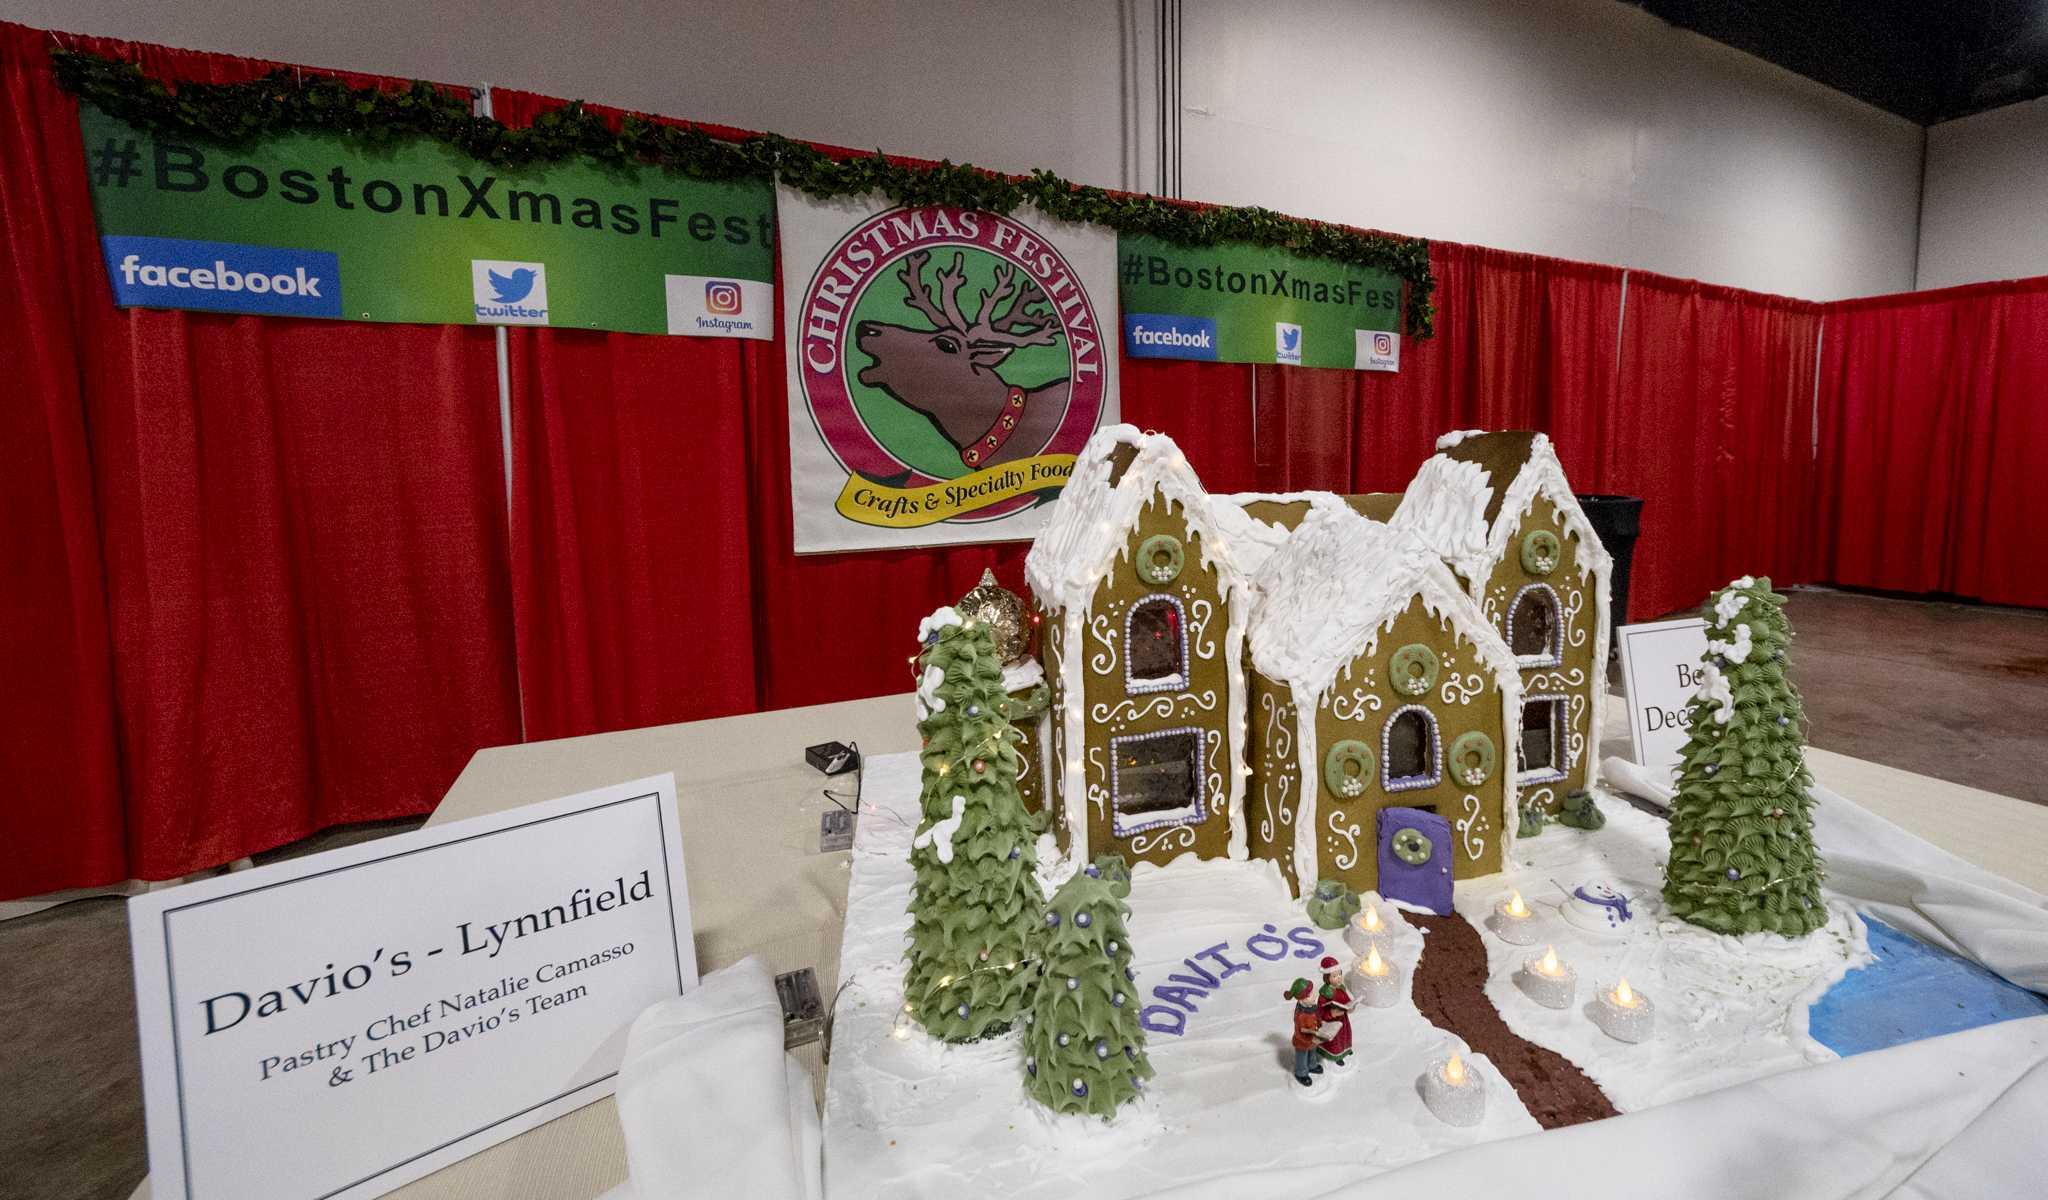 Boston Christmas Festival.Boston Kicks Off Holiday Season With Craft Festival The